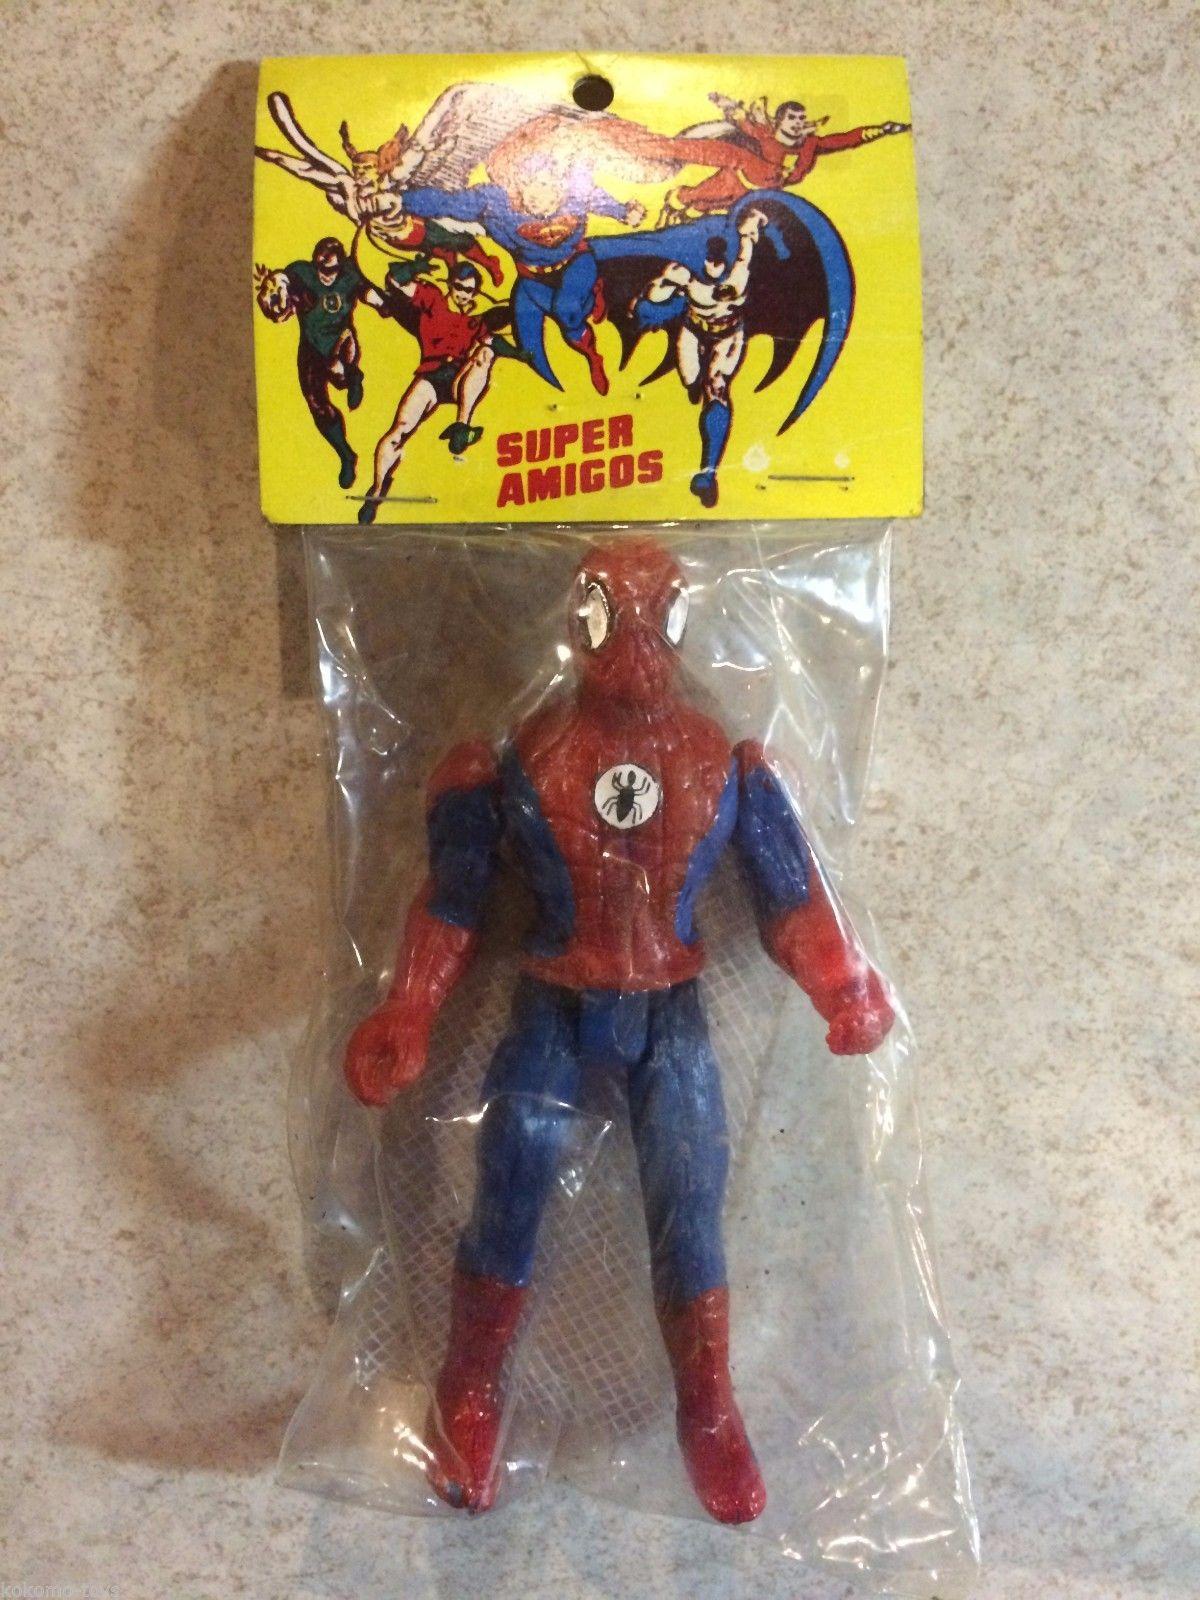 Spider-Man (Super Amigos figure)